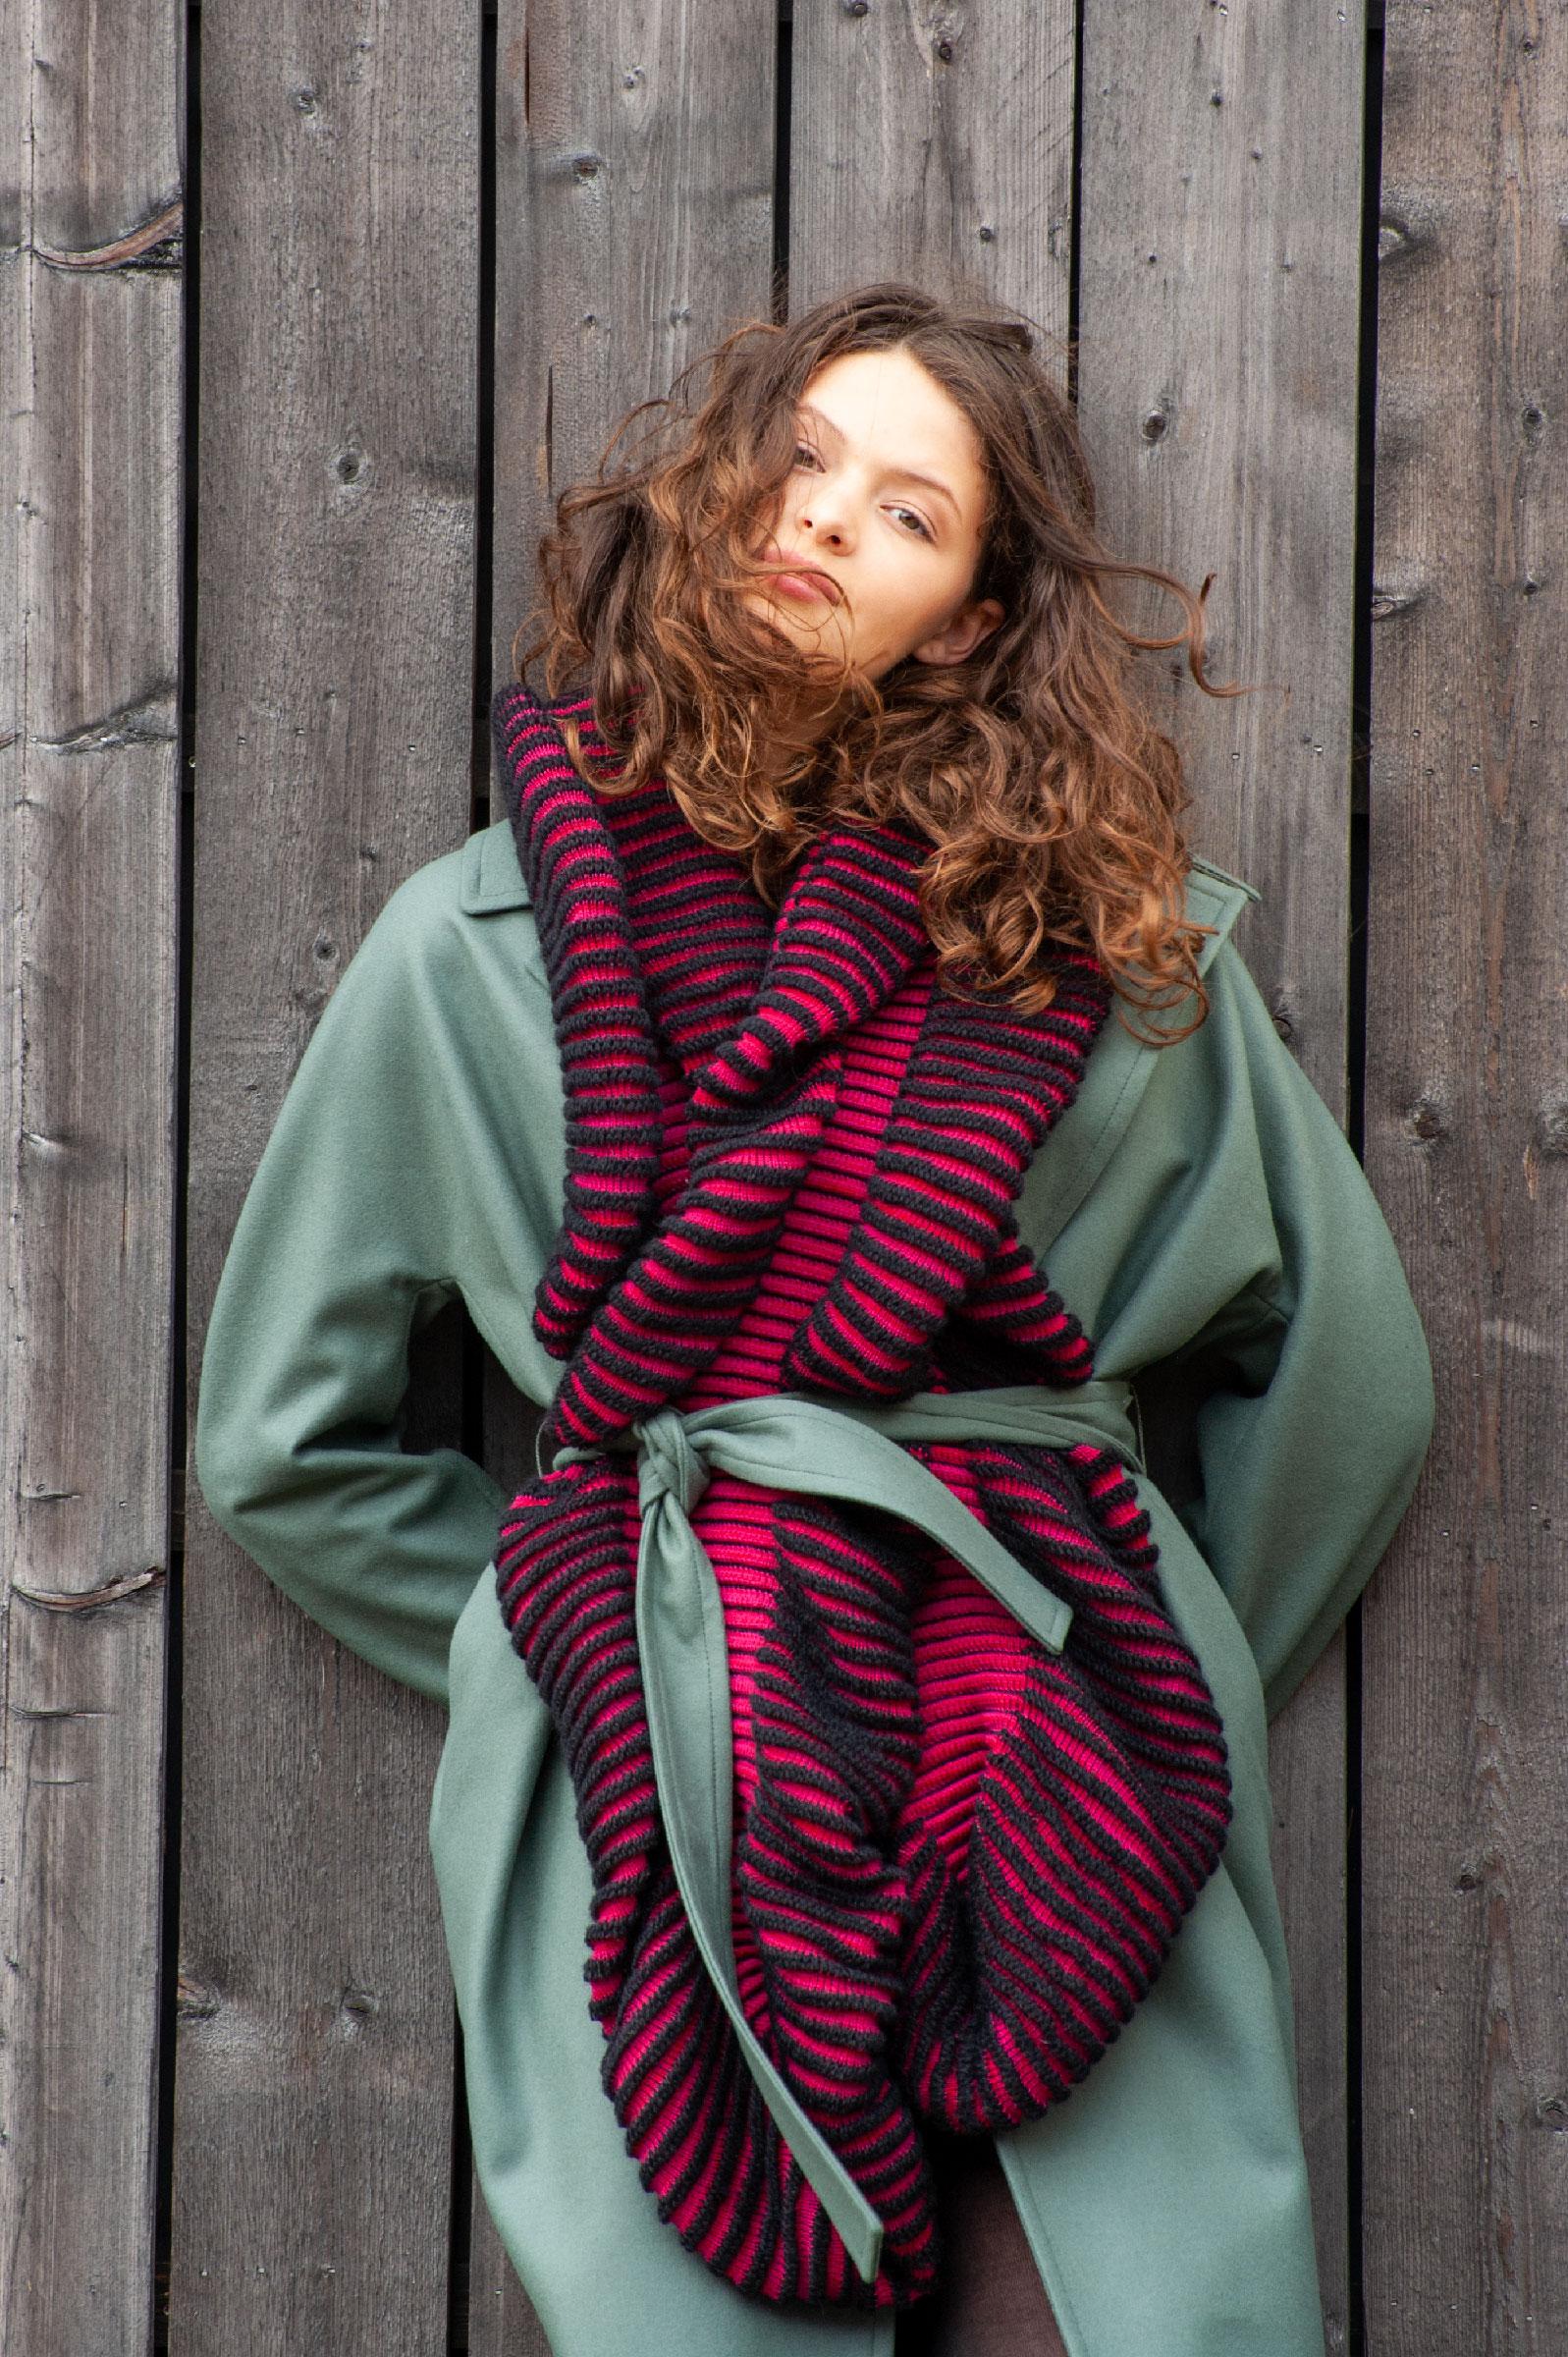 Cauliflower scarf